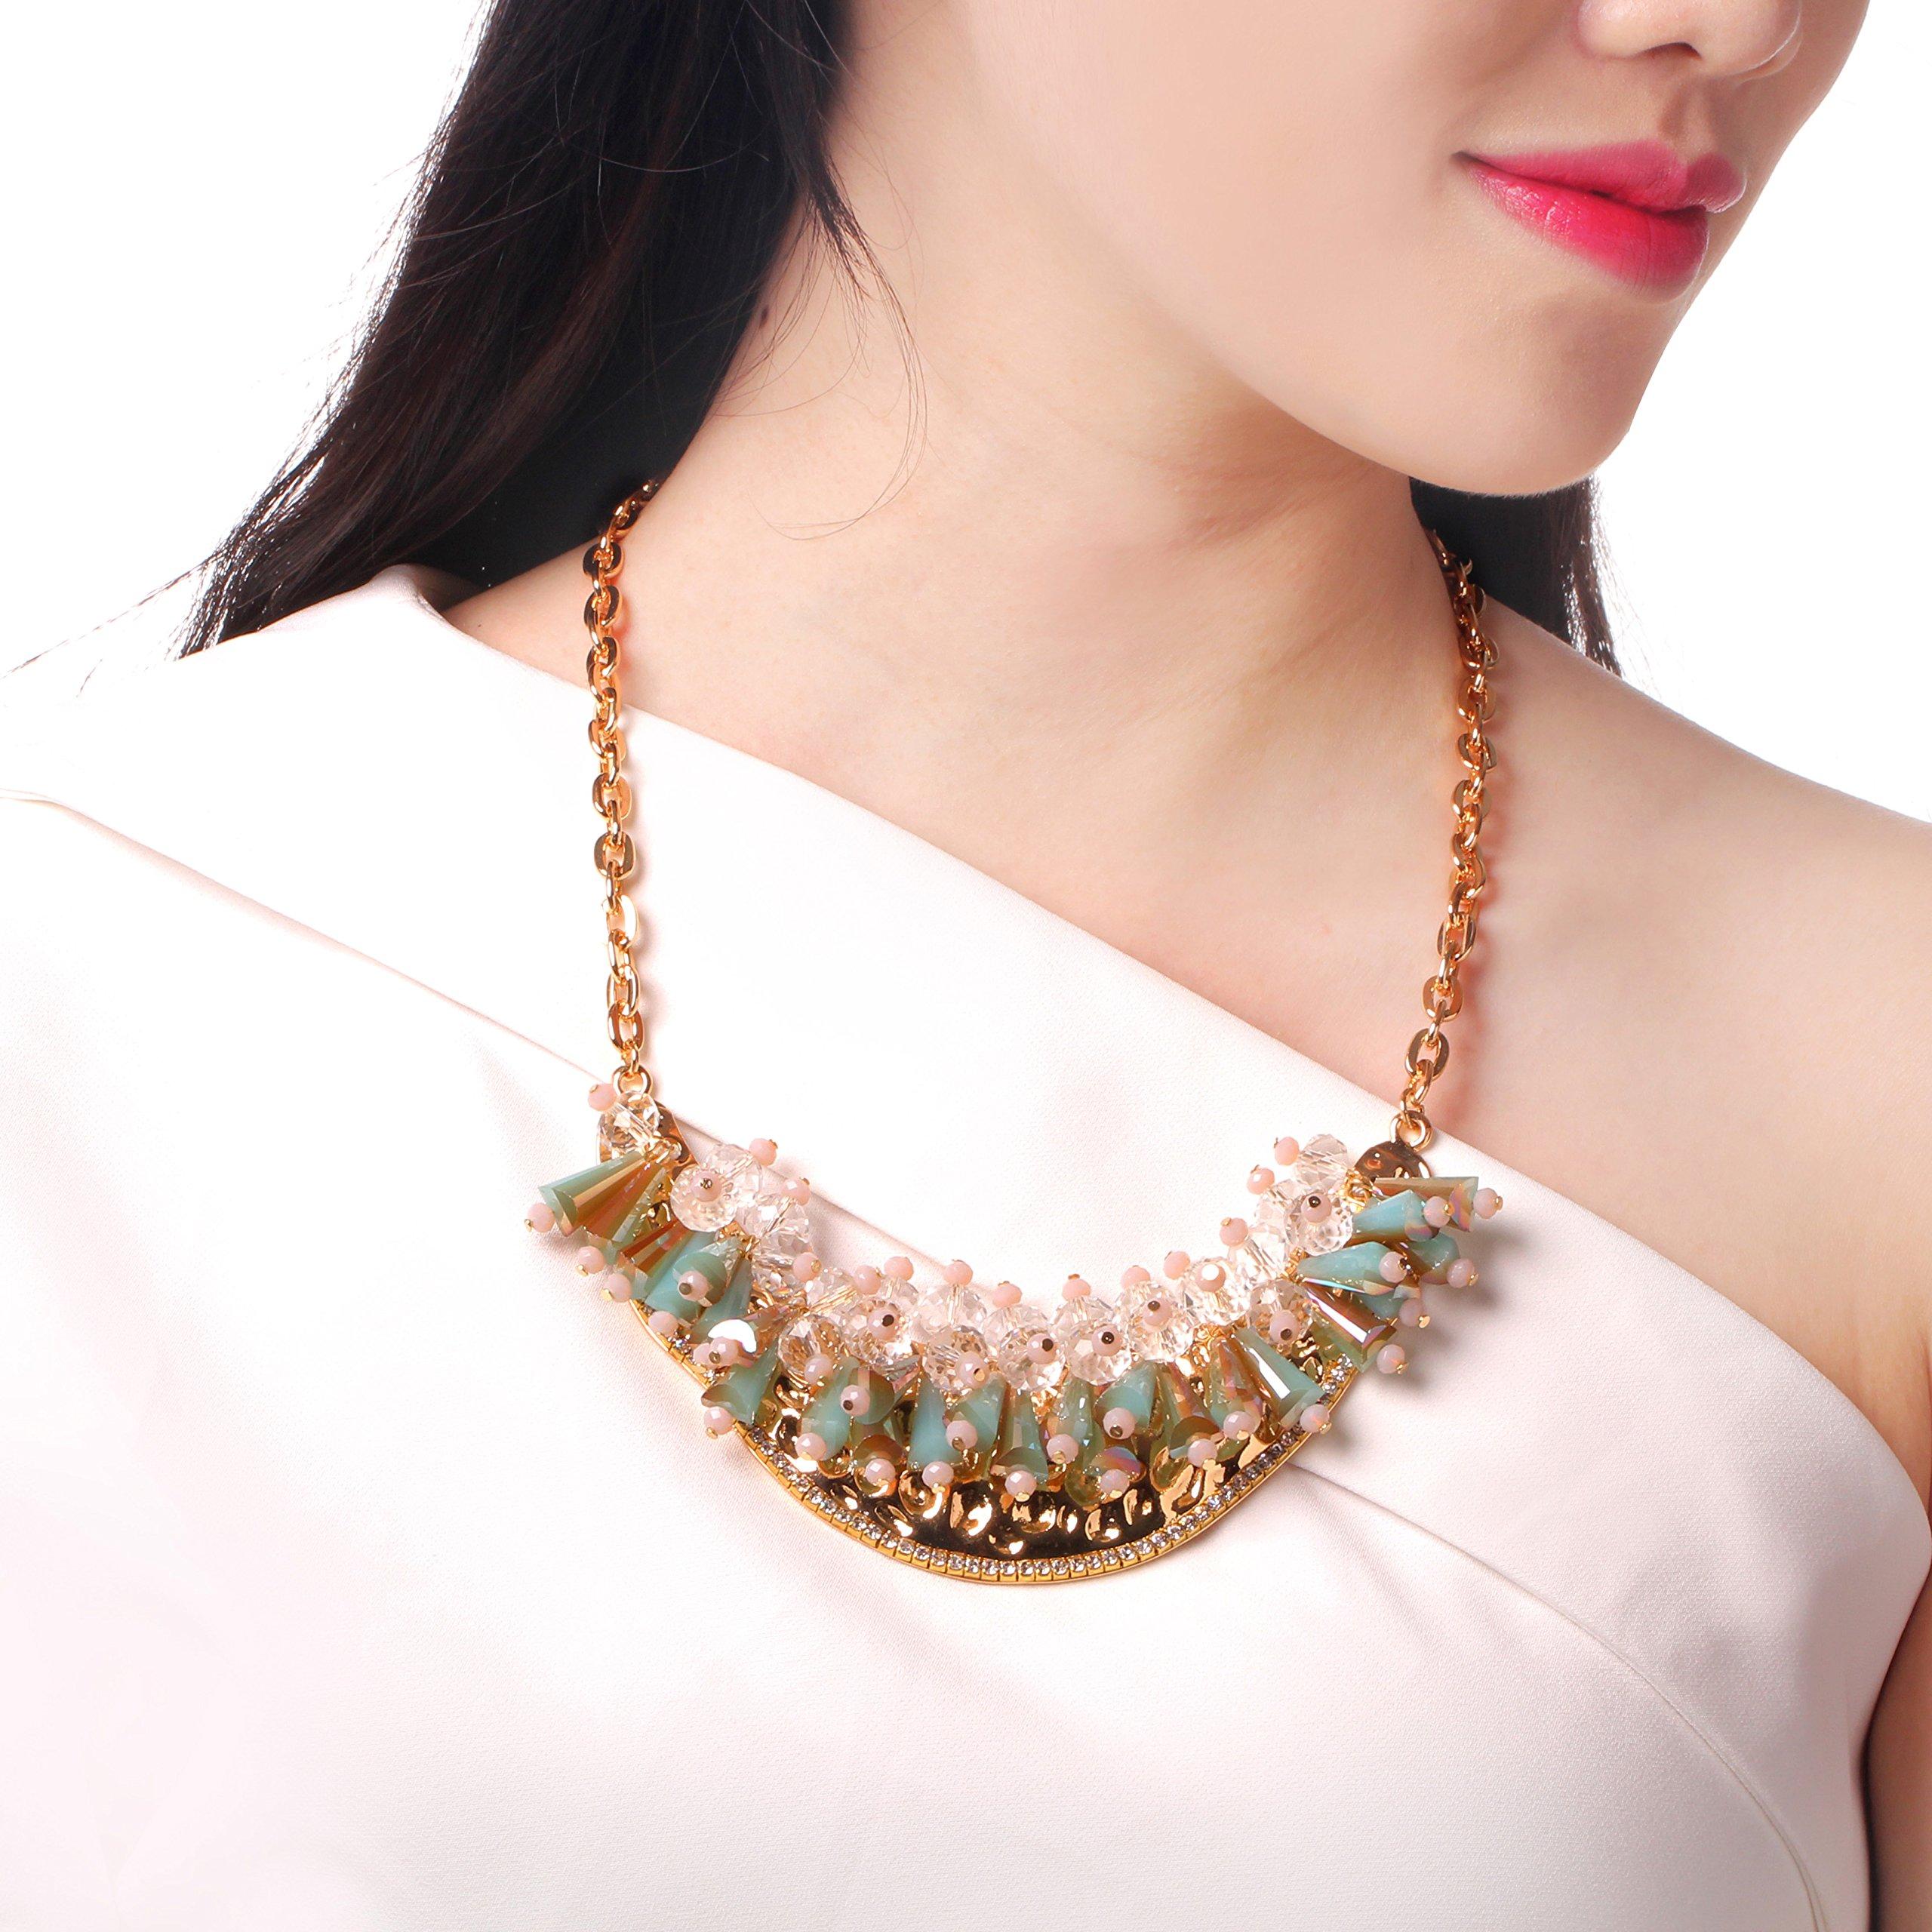 HONEYJOY New Dazzle Colour Crystal Female Luxury Clavicle Short Chain Exaggerated Fashion Necklace(blue) by HONEYJOY (Image #1)